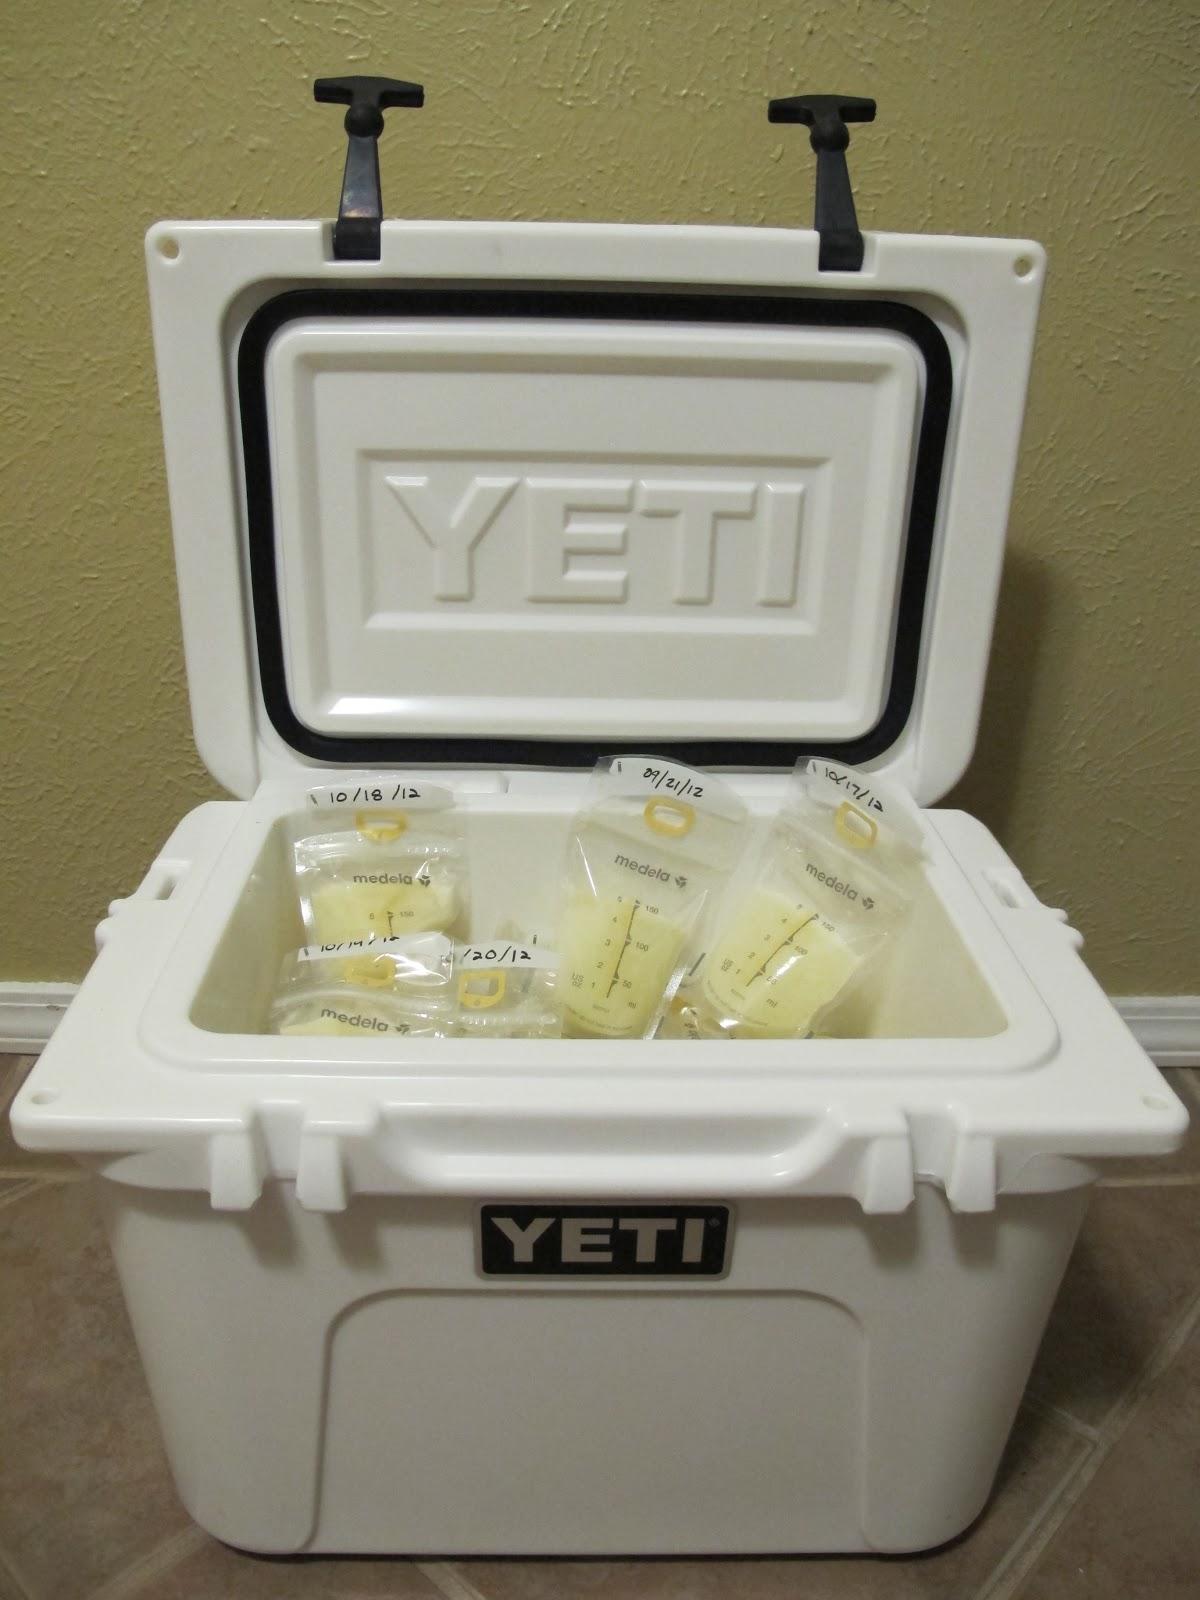 Bedroom Baby Milk Cooler: Run Daddy Run: Yeti Coolers, Frozen Breast Milk, And A